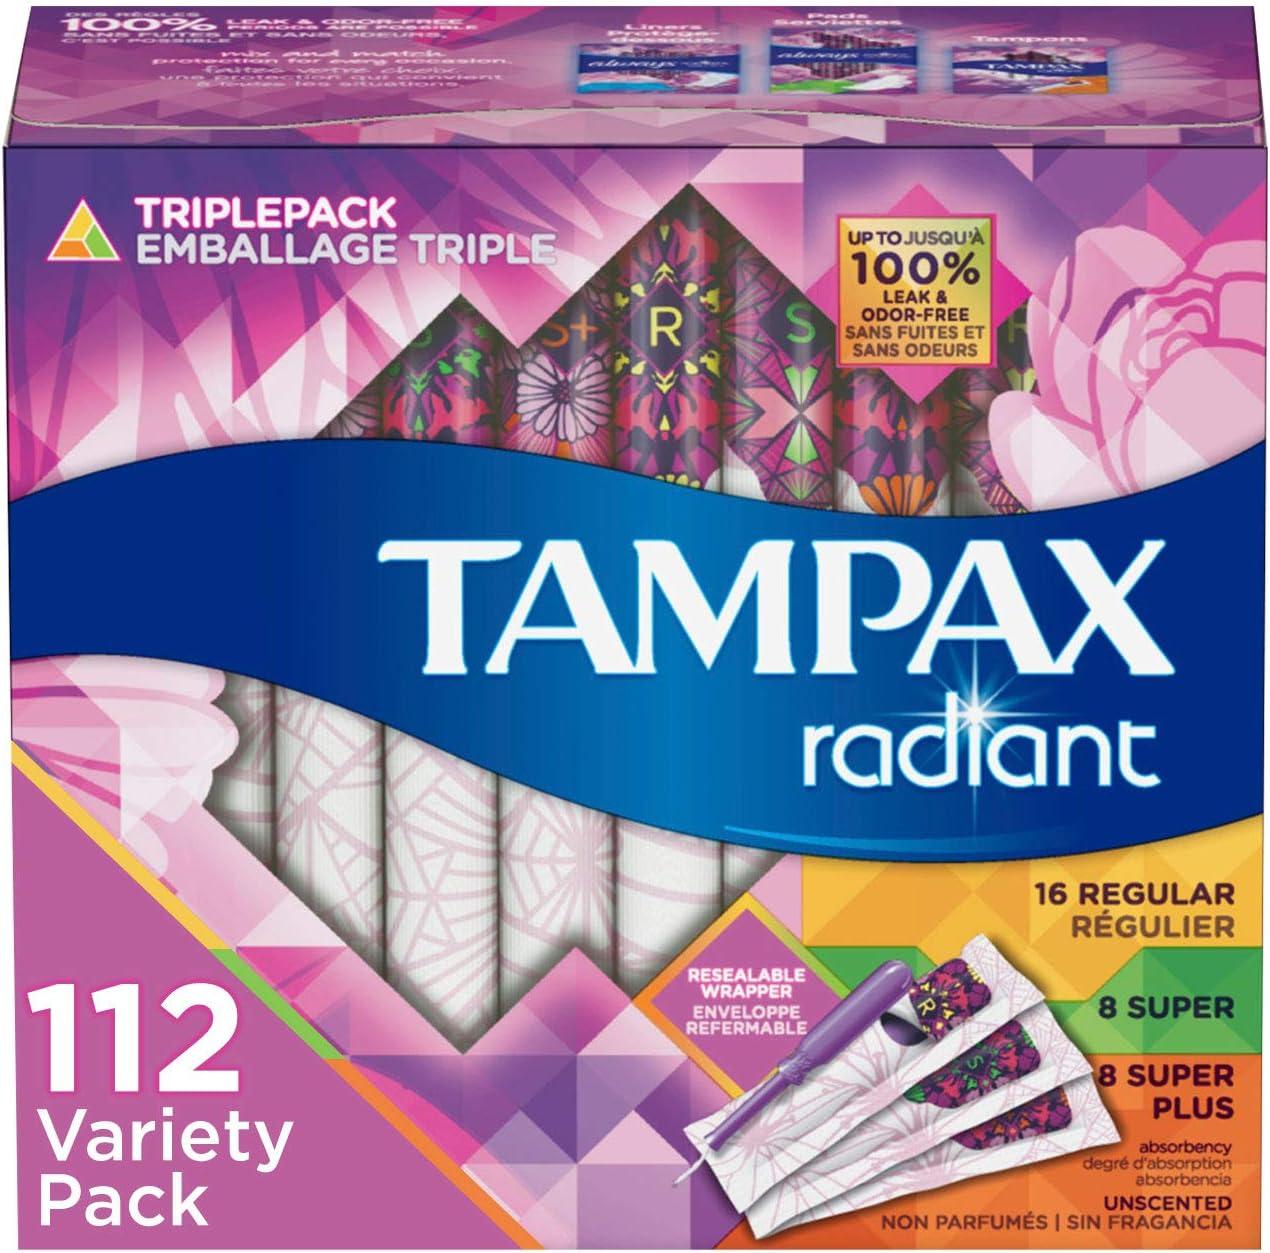 Tampax Radiant Plastic Tampons, Regular/Super/Super Plus Absorbency Triplepack, 112 Count